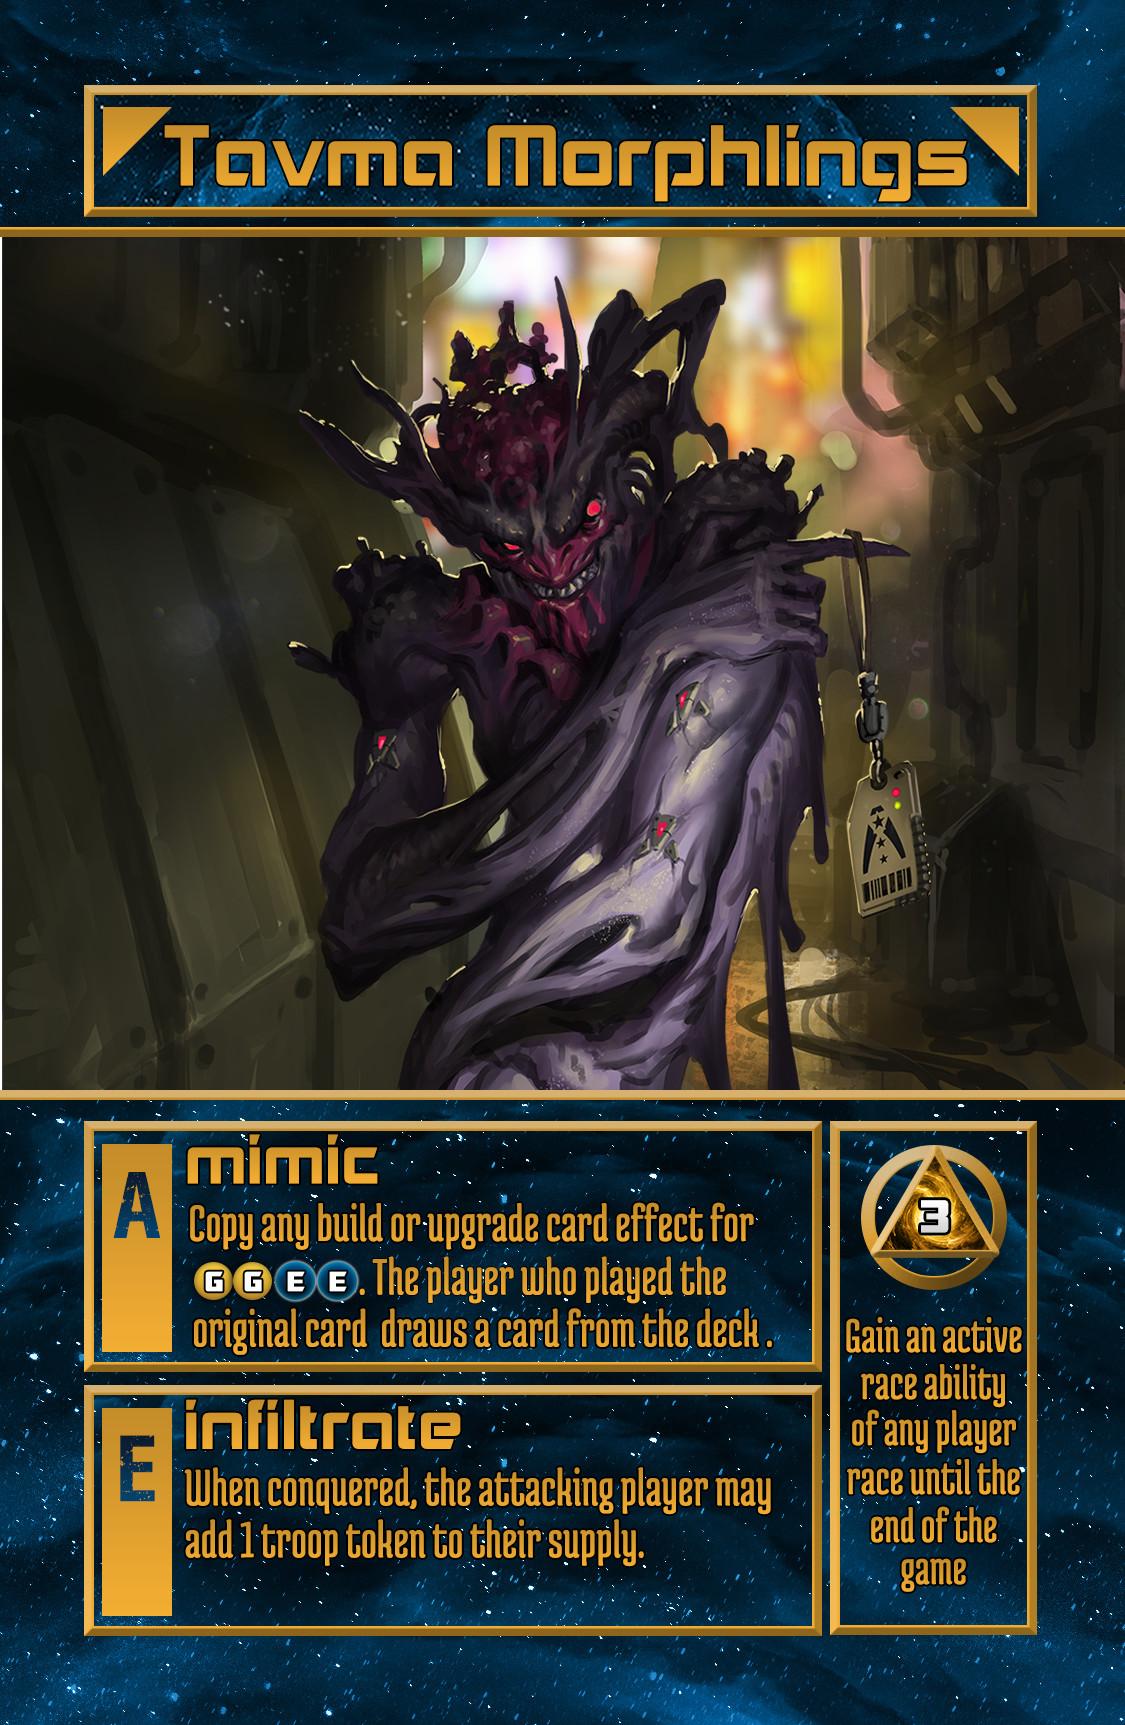 Albert urmanov jumbo card tavma morphlings protov5